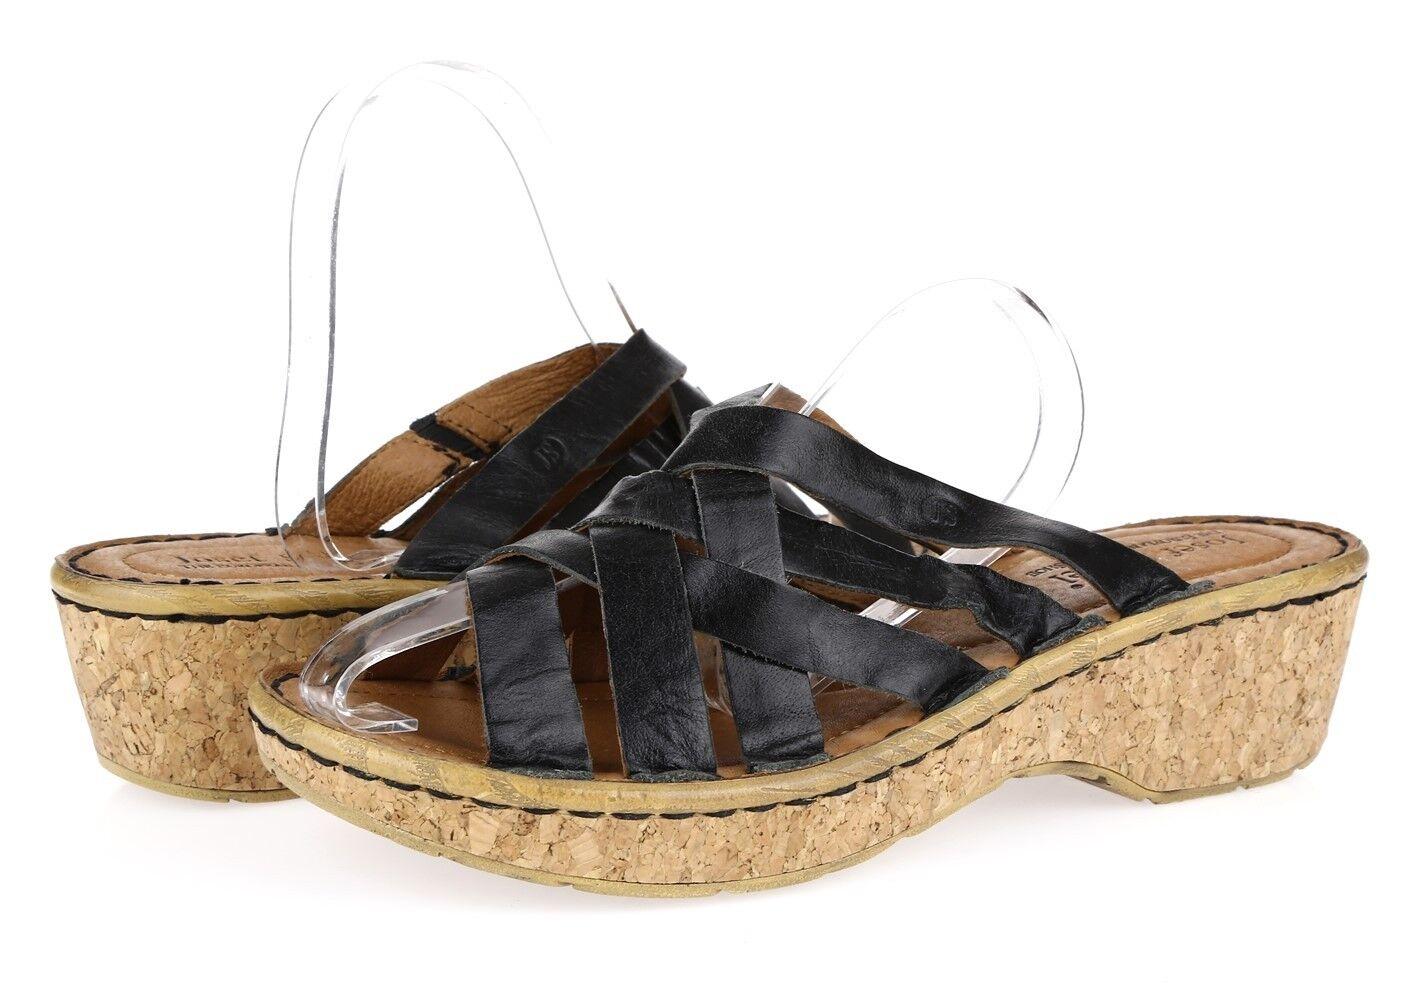 Women's JOSEF SEIBEL 228206 black strappy wedge sandals sz. 41